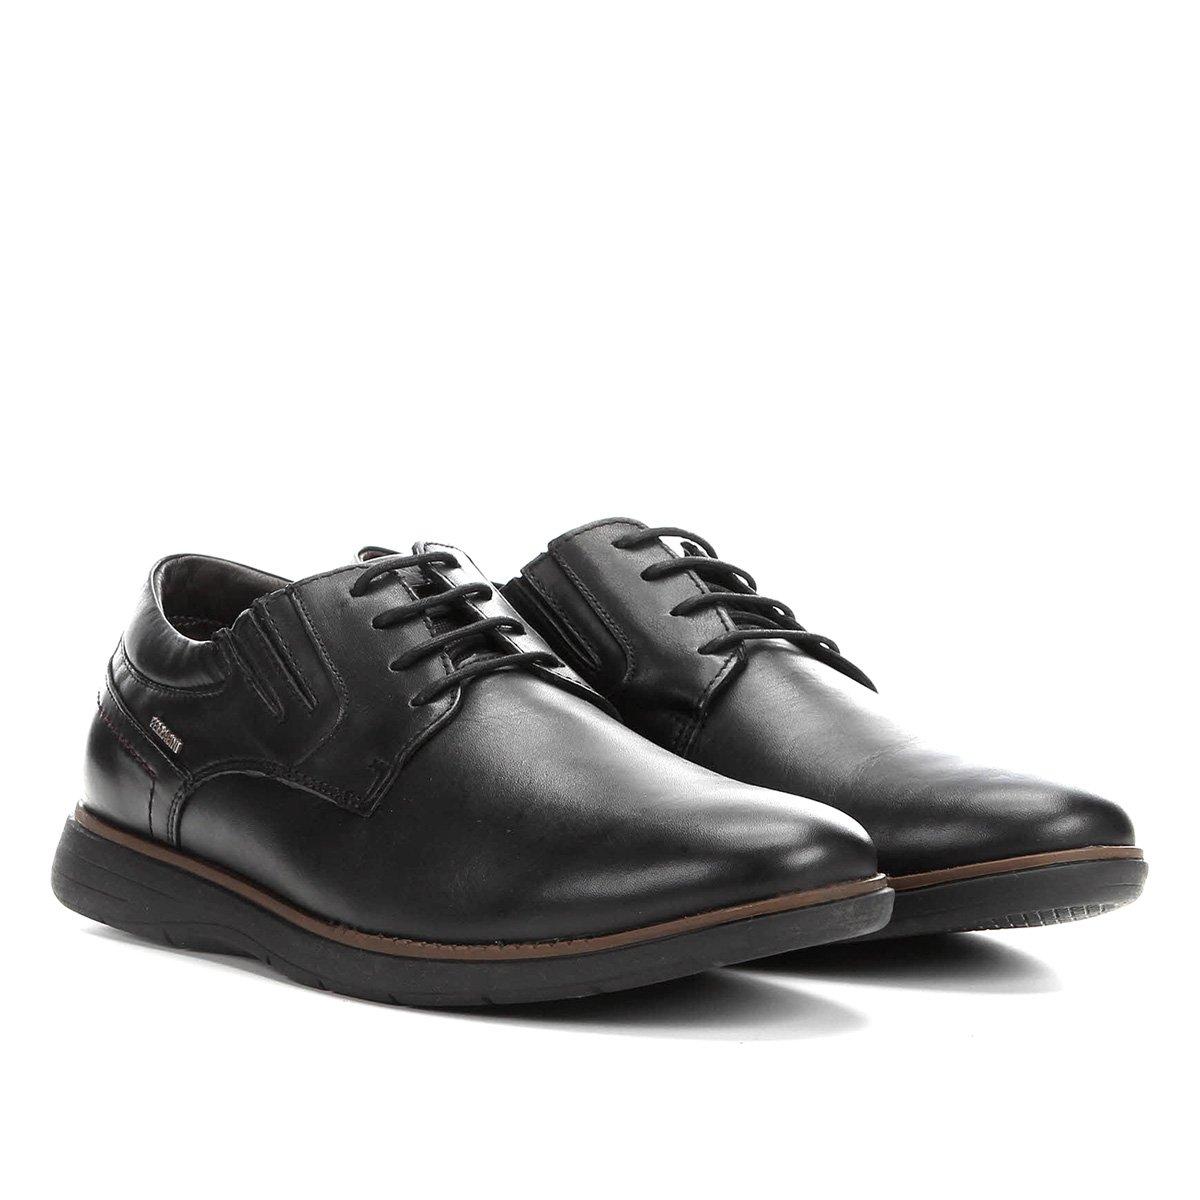 7fad05f5a Sapato Ferracini Preto Couro Casual Cadarço Trindade - Conceito M